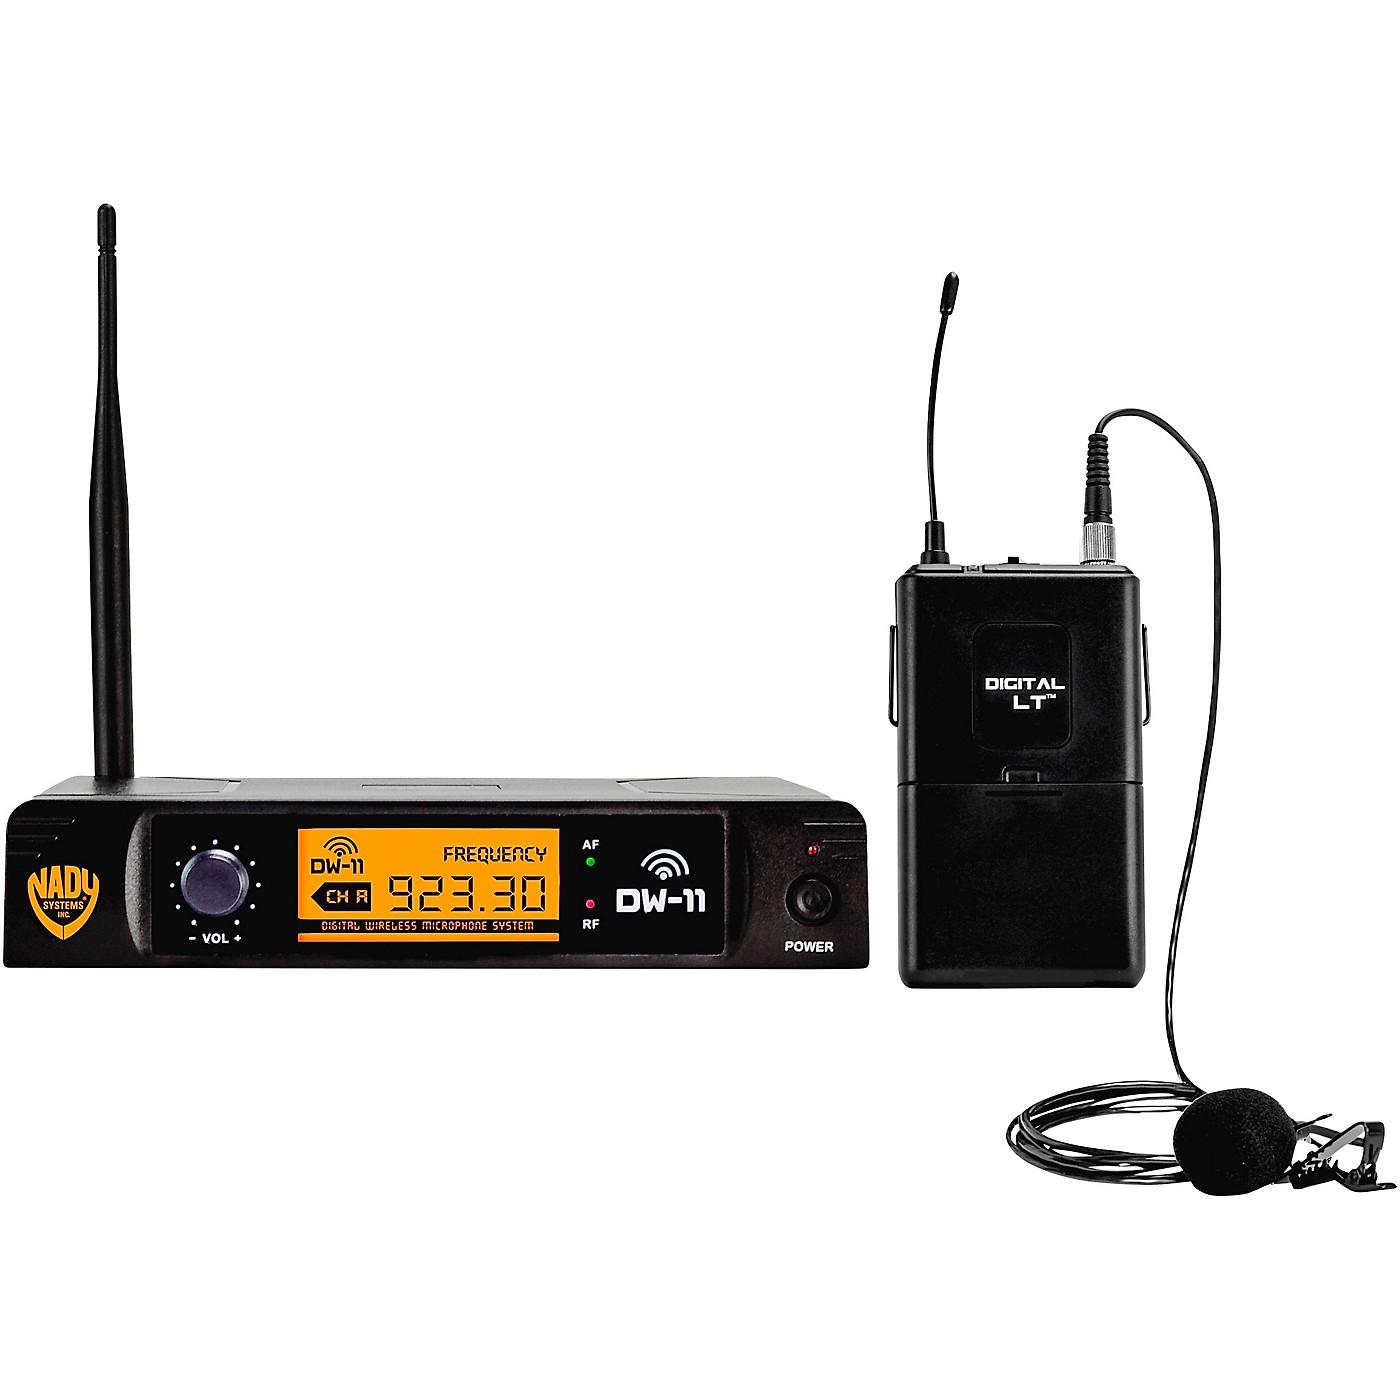 Nady DW-11 LT 24 bit Digital Lapel Wireless Microphone System thumbnail